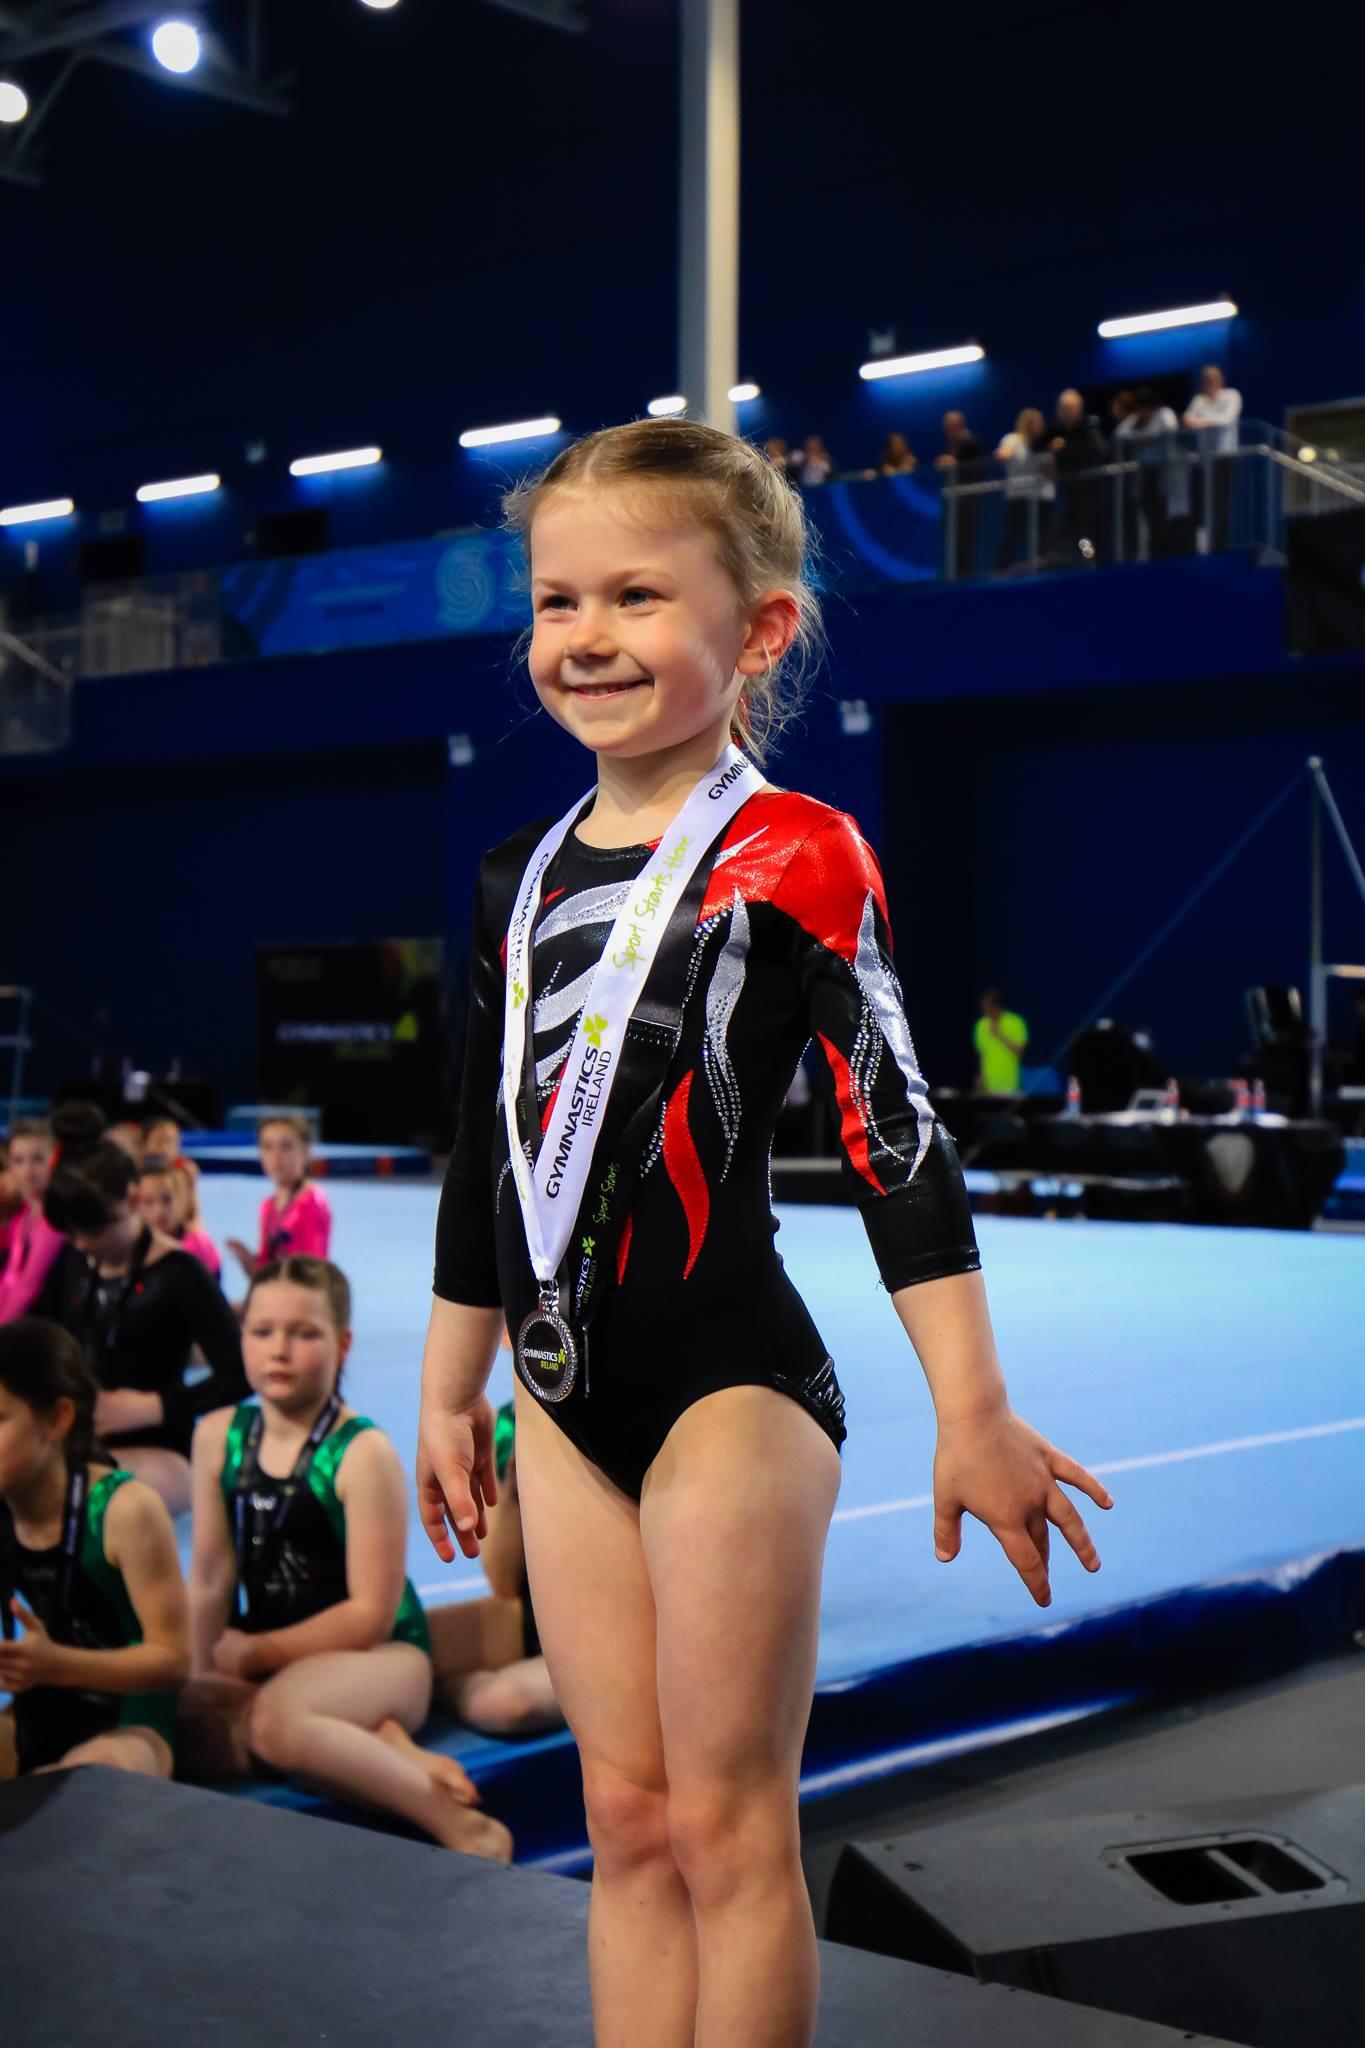 National Level 2-4 All Around Competition 2017 - Sugarloaf Gymnastics